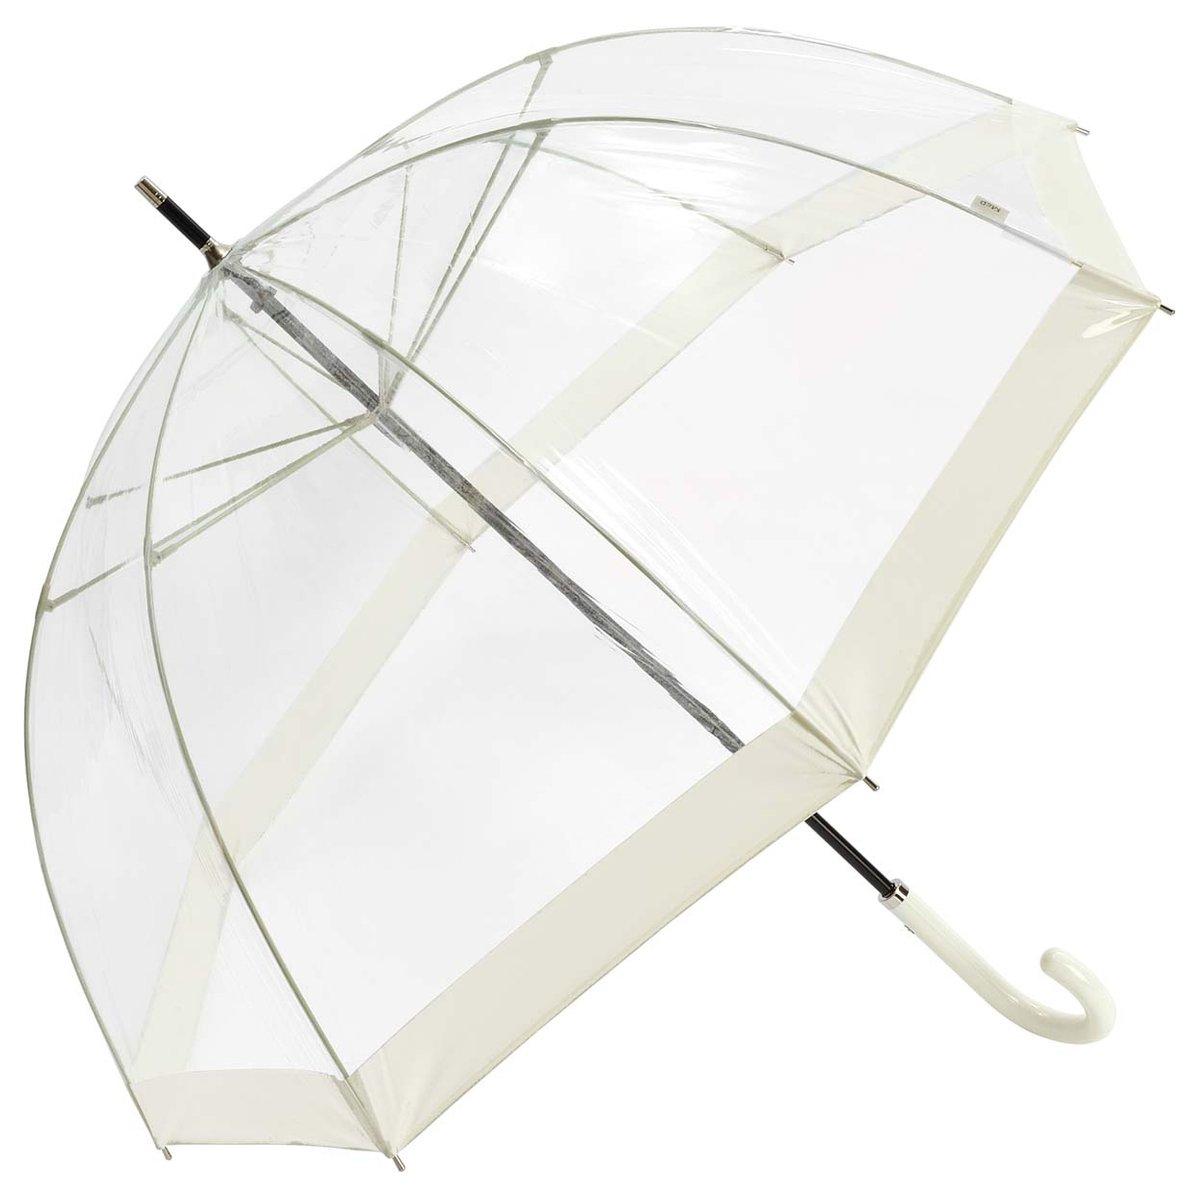 Regenschirm Transparent Durchsichtig Glockenschirm Kuppel Damenschirm Rot